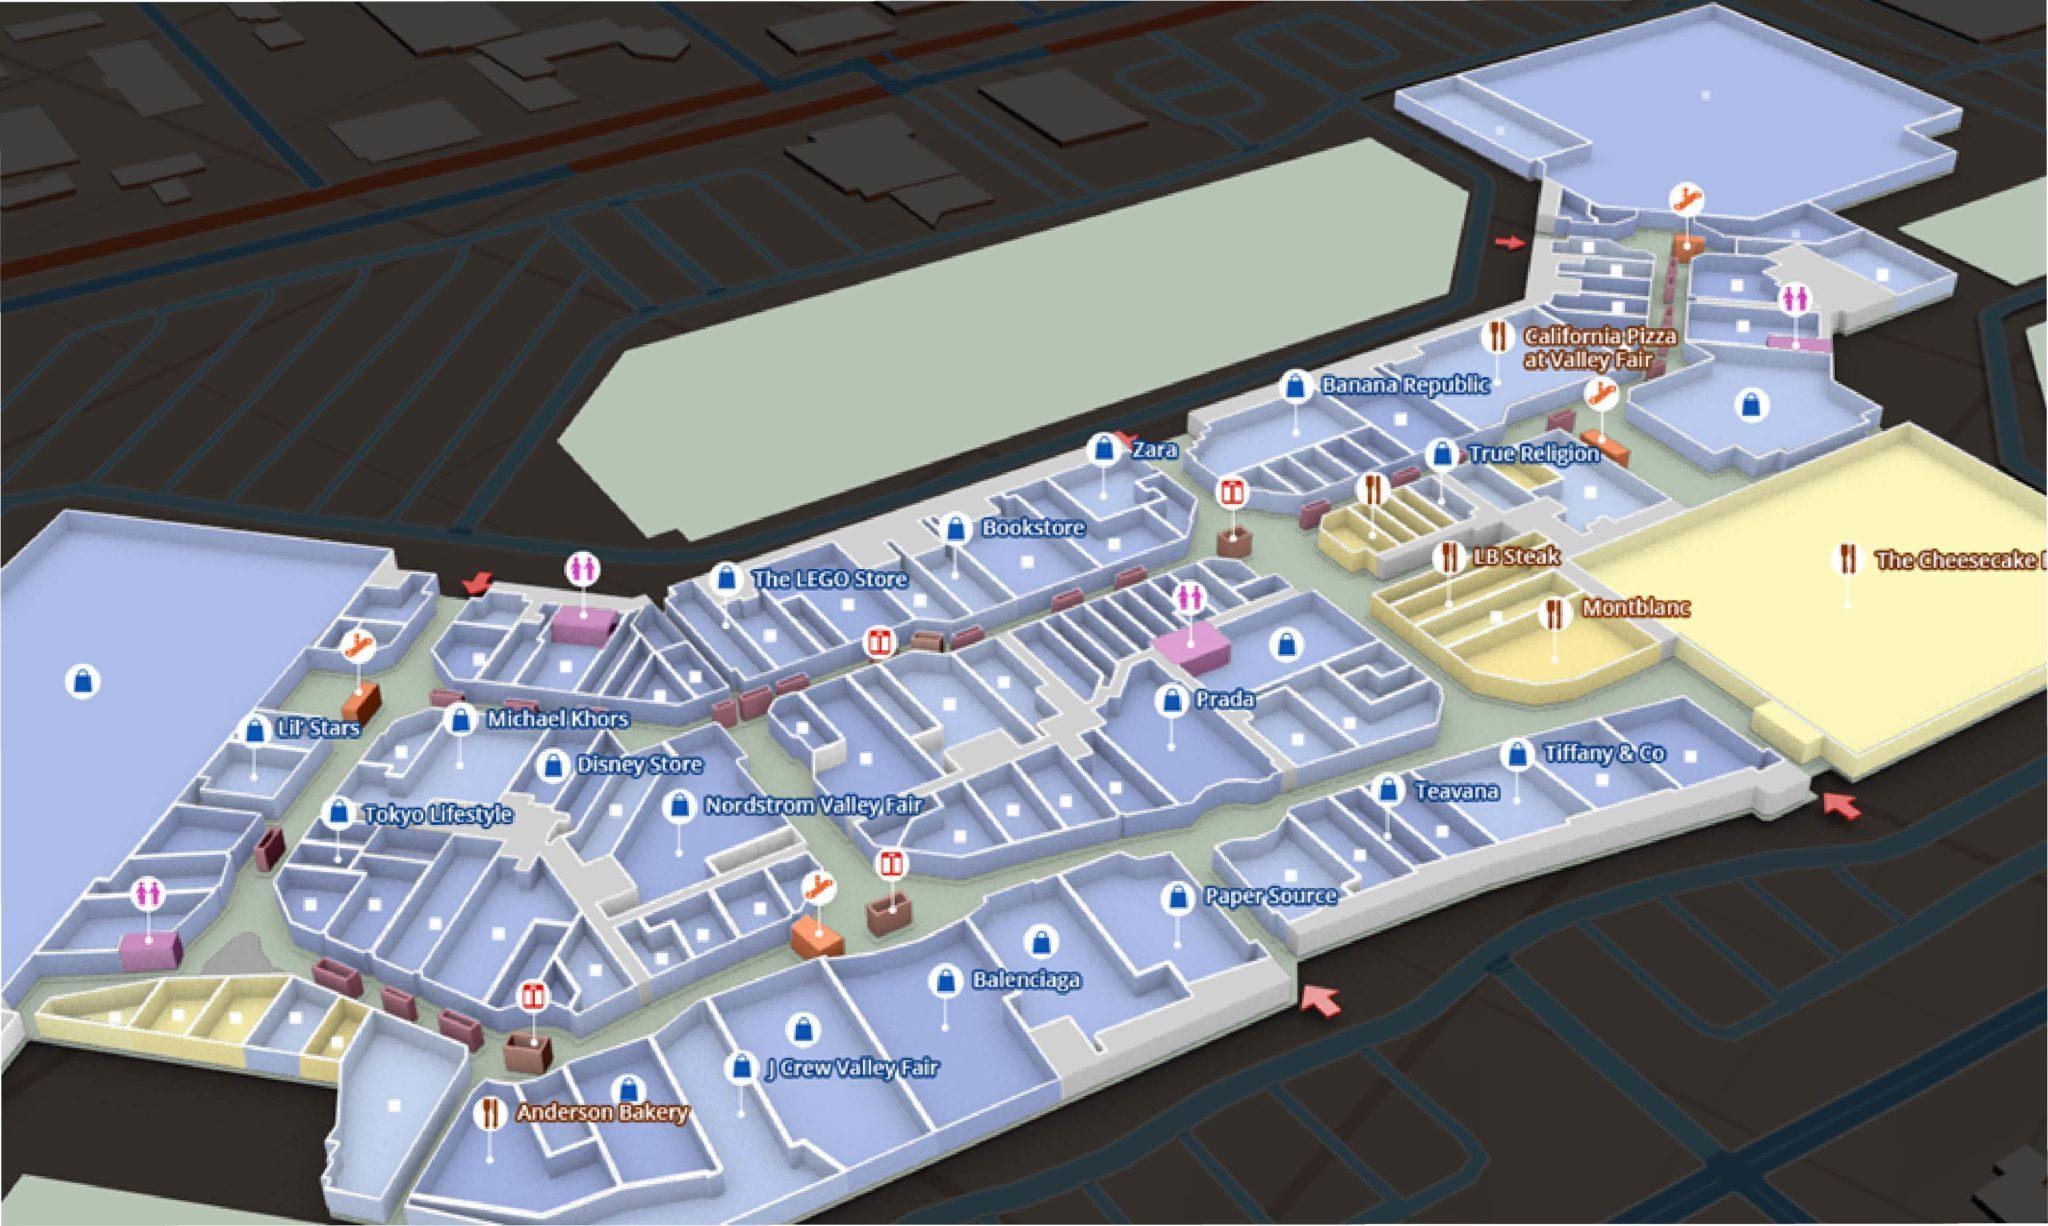 Customizable map